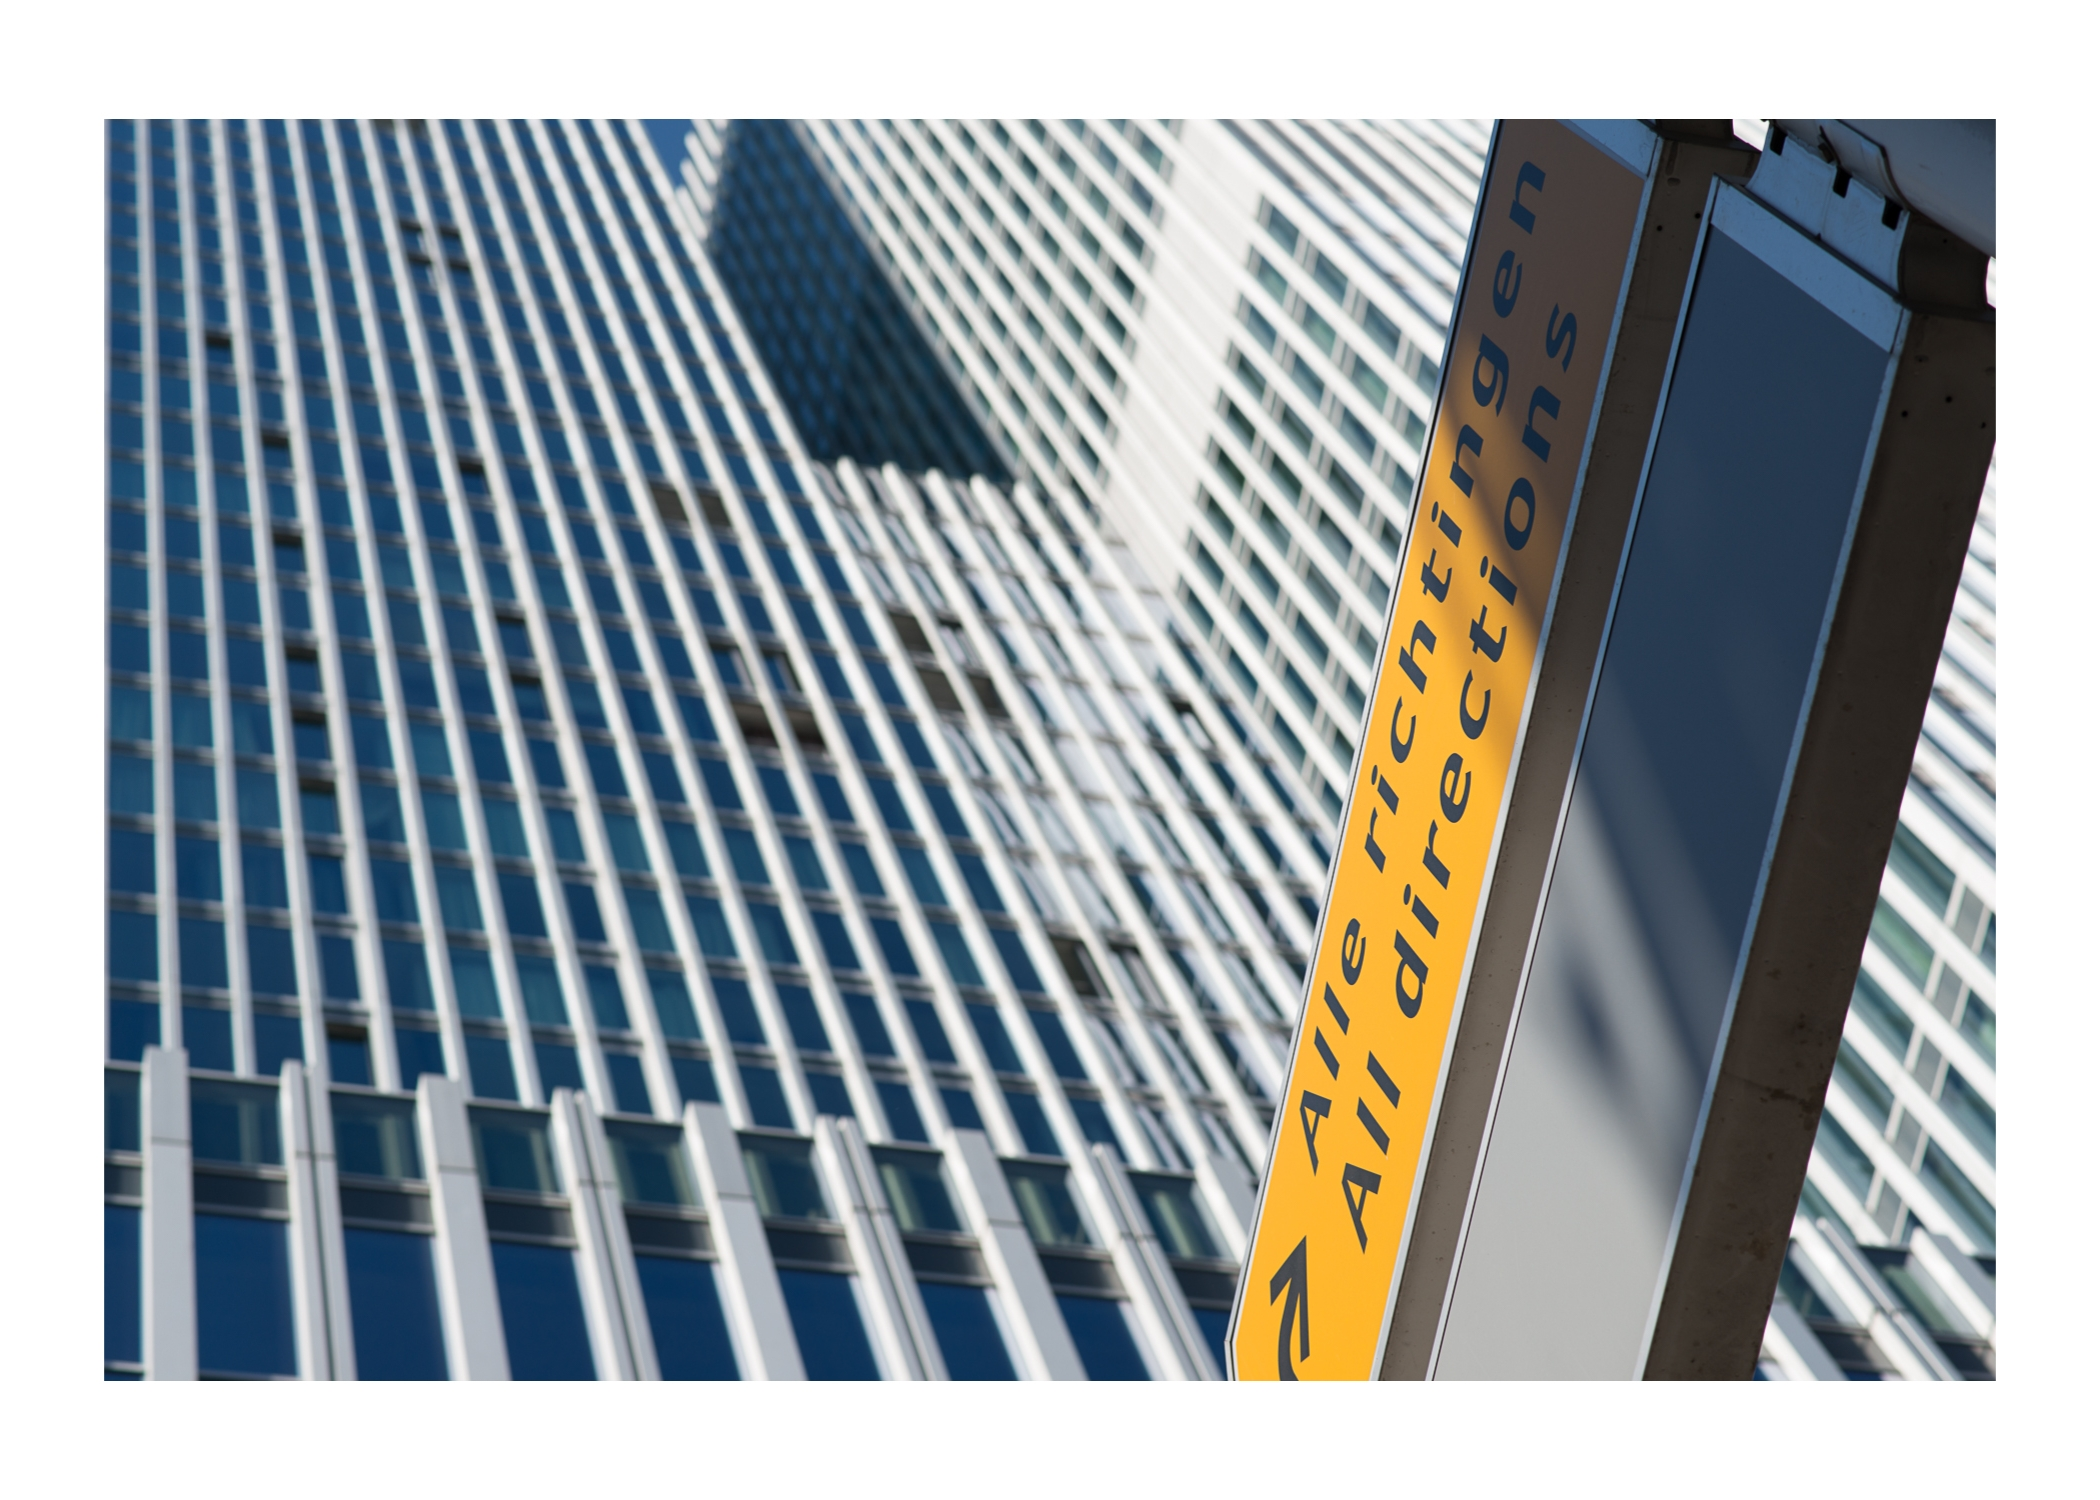 2016 De Rotterdam - Alle richtingen